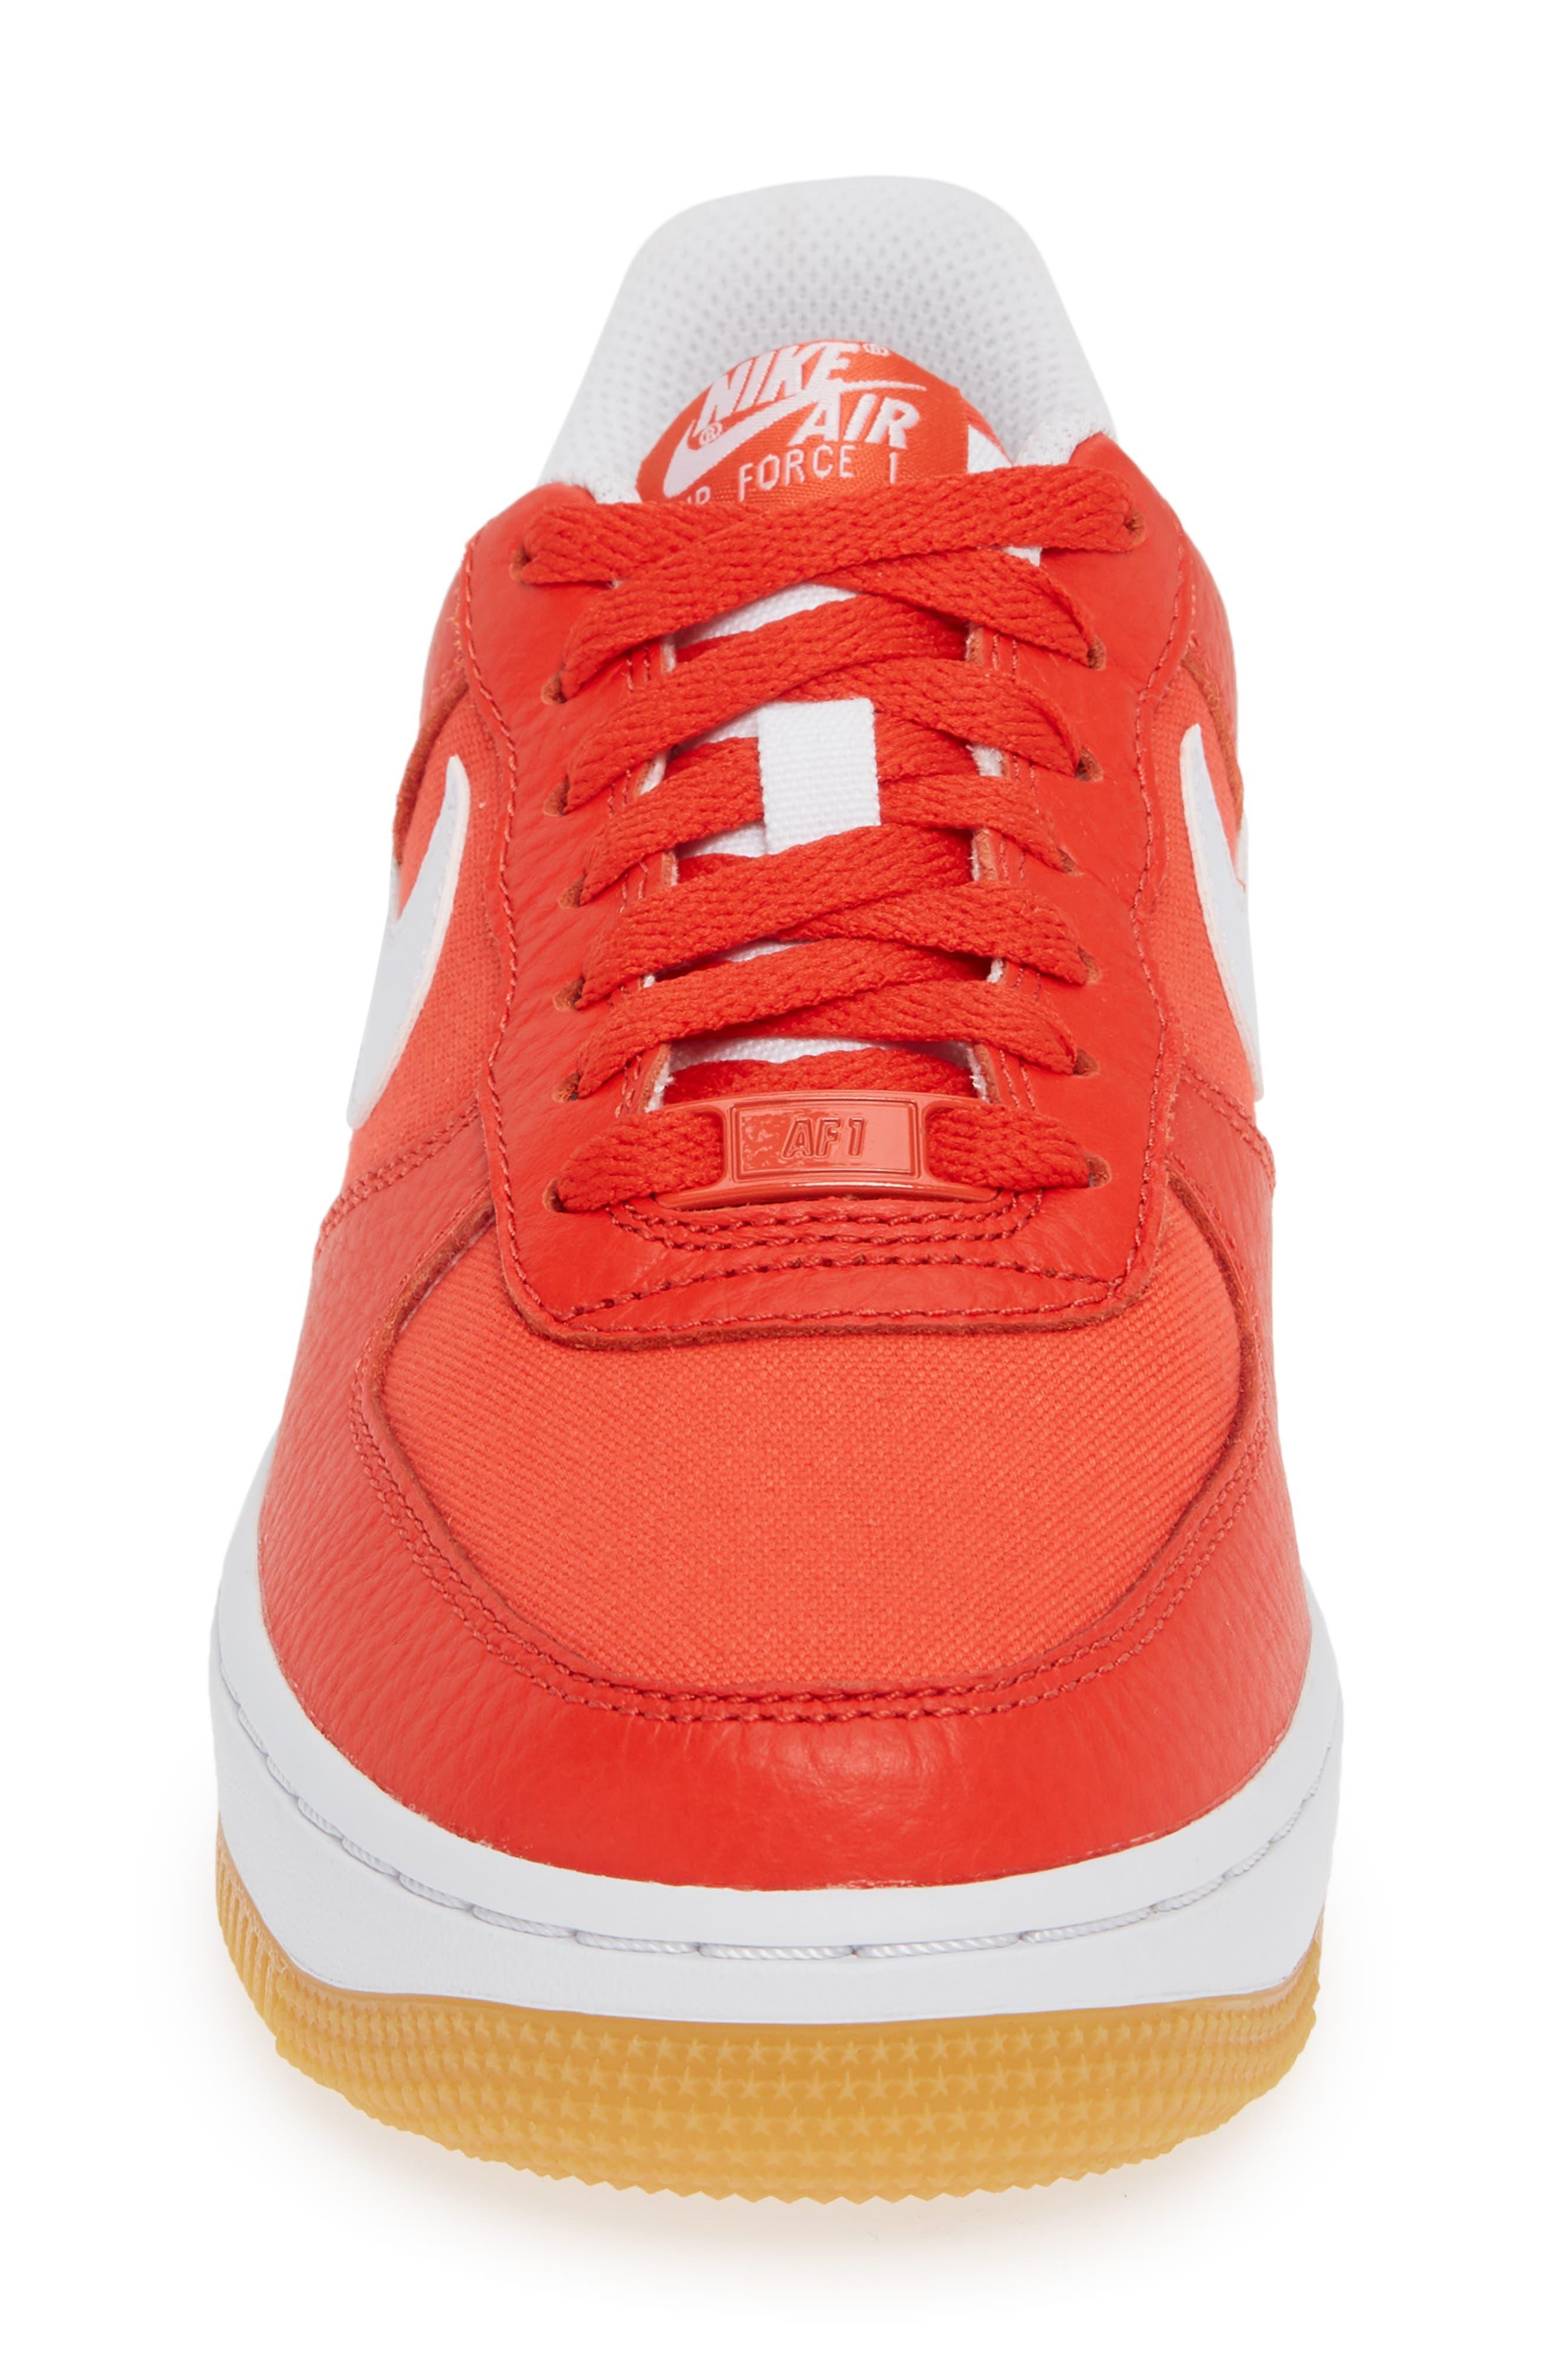 Air Force 1 '07 Premium Sneaker,                             Alternate thumbnail 4, color,                             Red/ White/ Light Brown